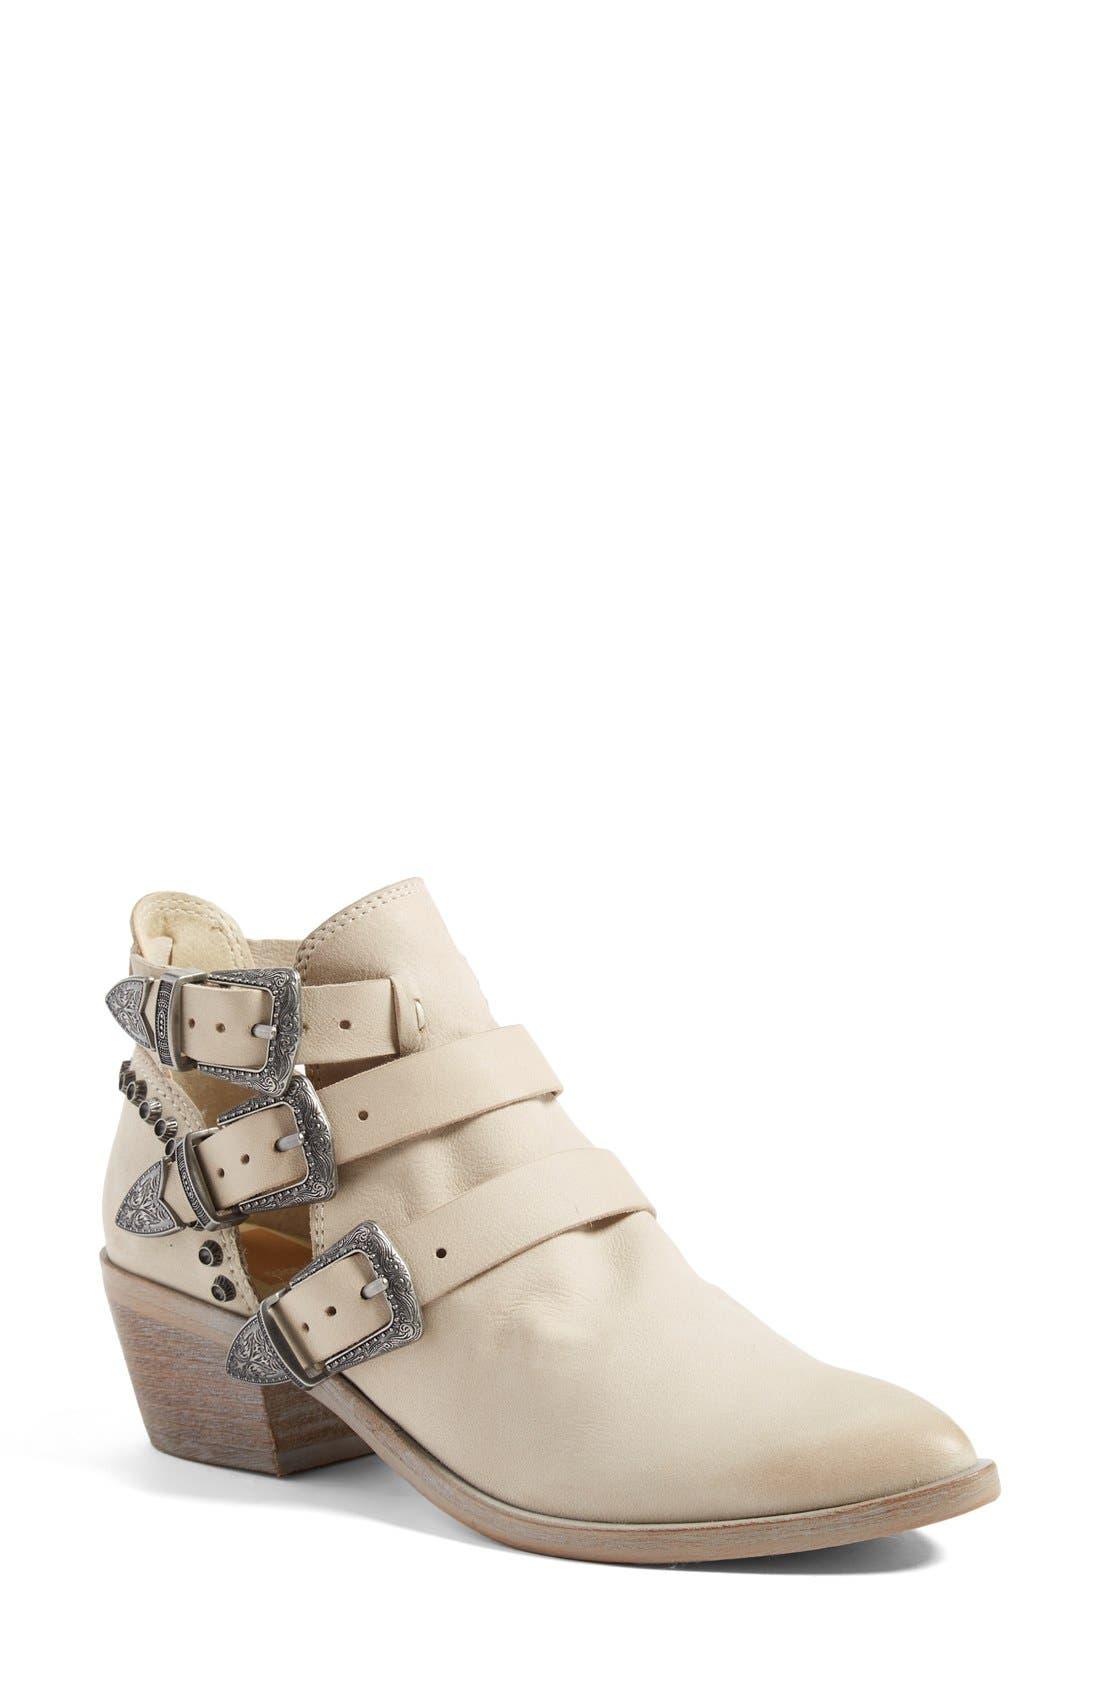 Spurr Charlotte Ankle Boots Women HN59789